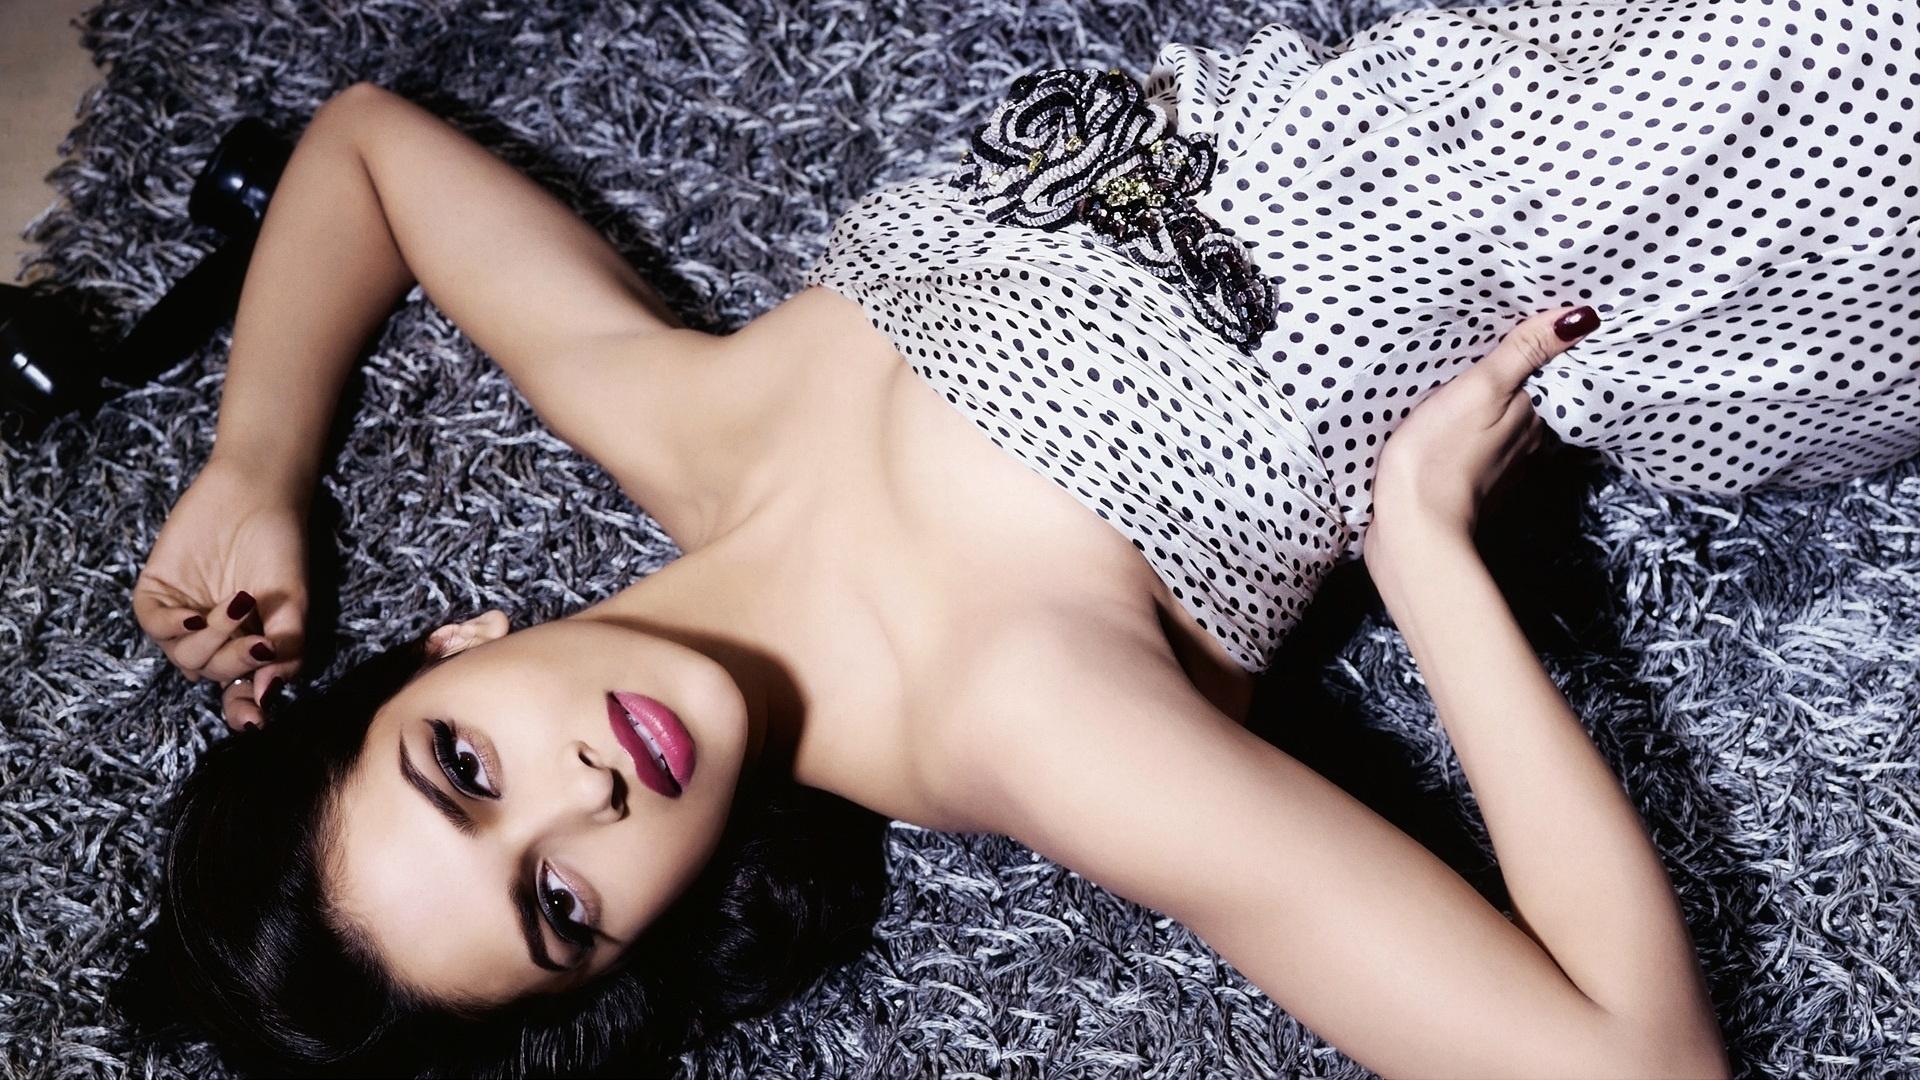 1920x1080 Deepika Padukone Hot Bollywood Actress 1080p Laptop Full Hd Wallpaper Hd Indian Celebrities 4k Wallpapers Images Photos And Background Wallpapers Den